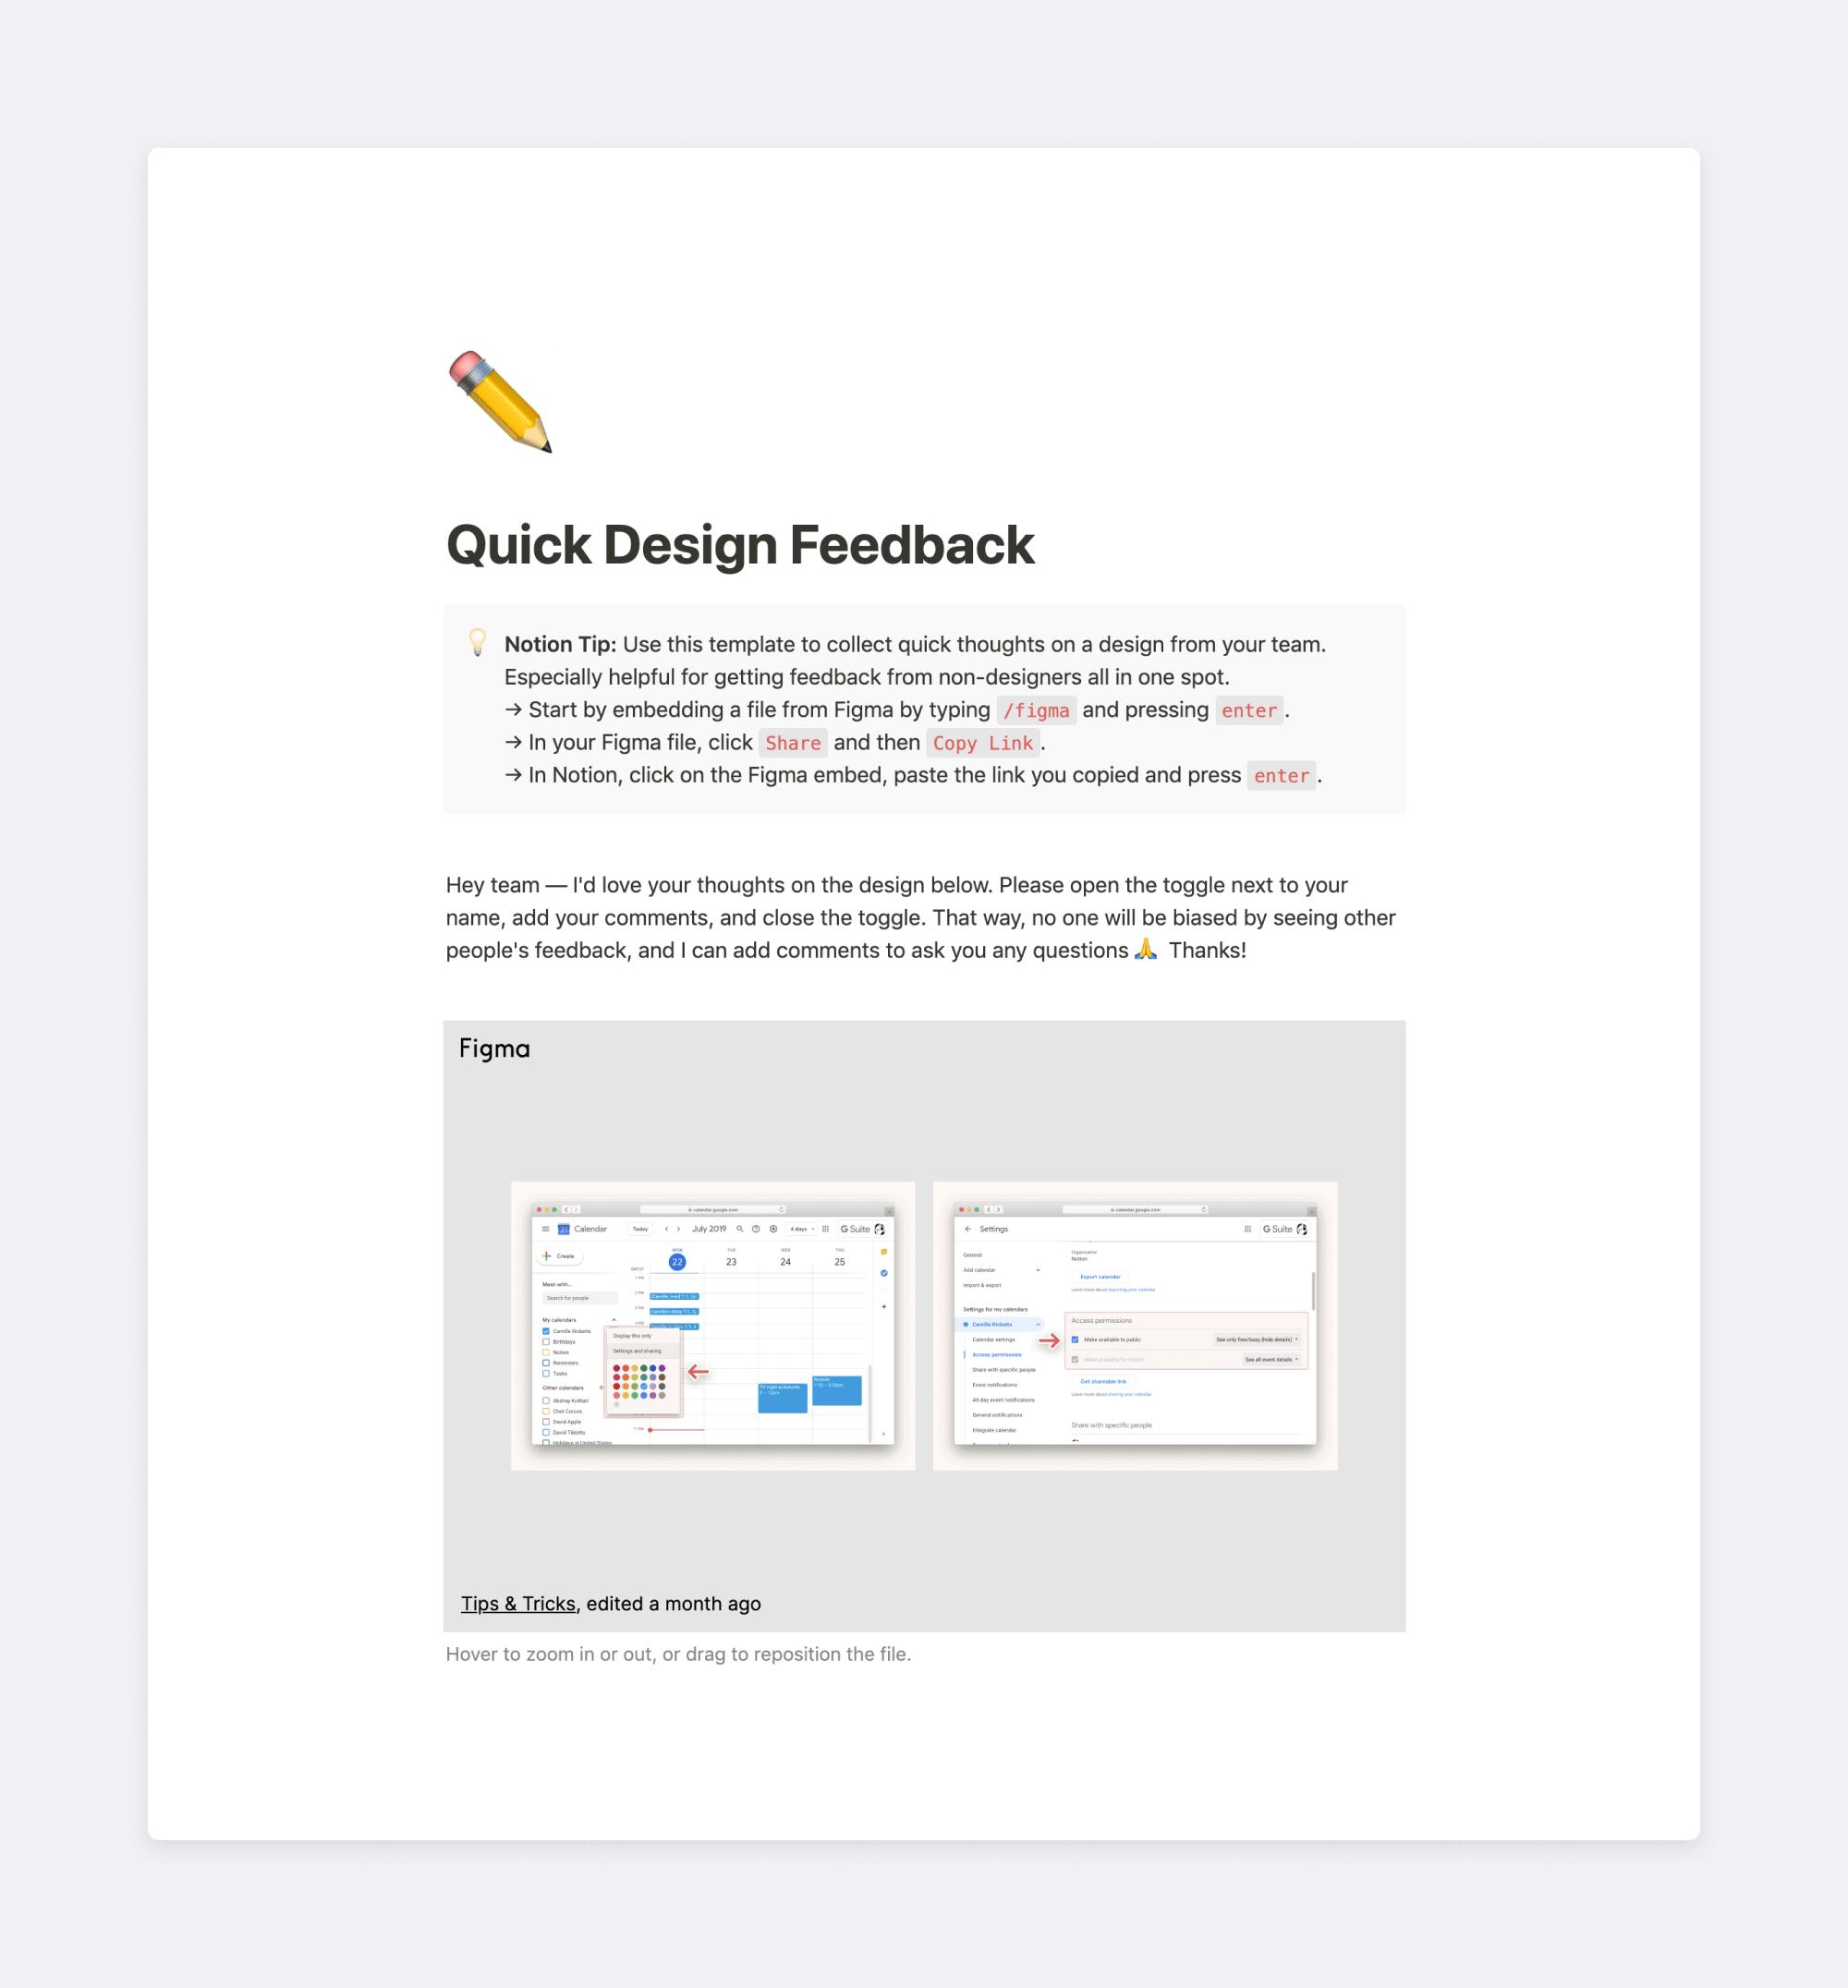 Quick Design Feedback